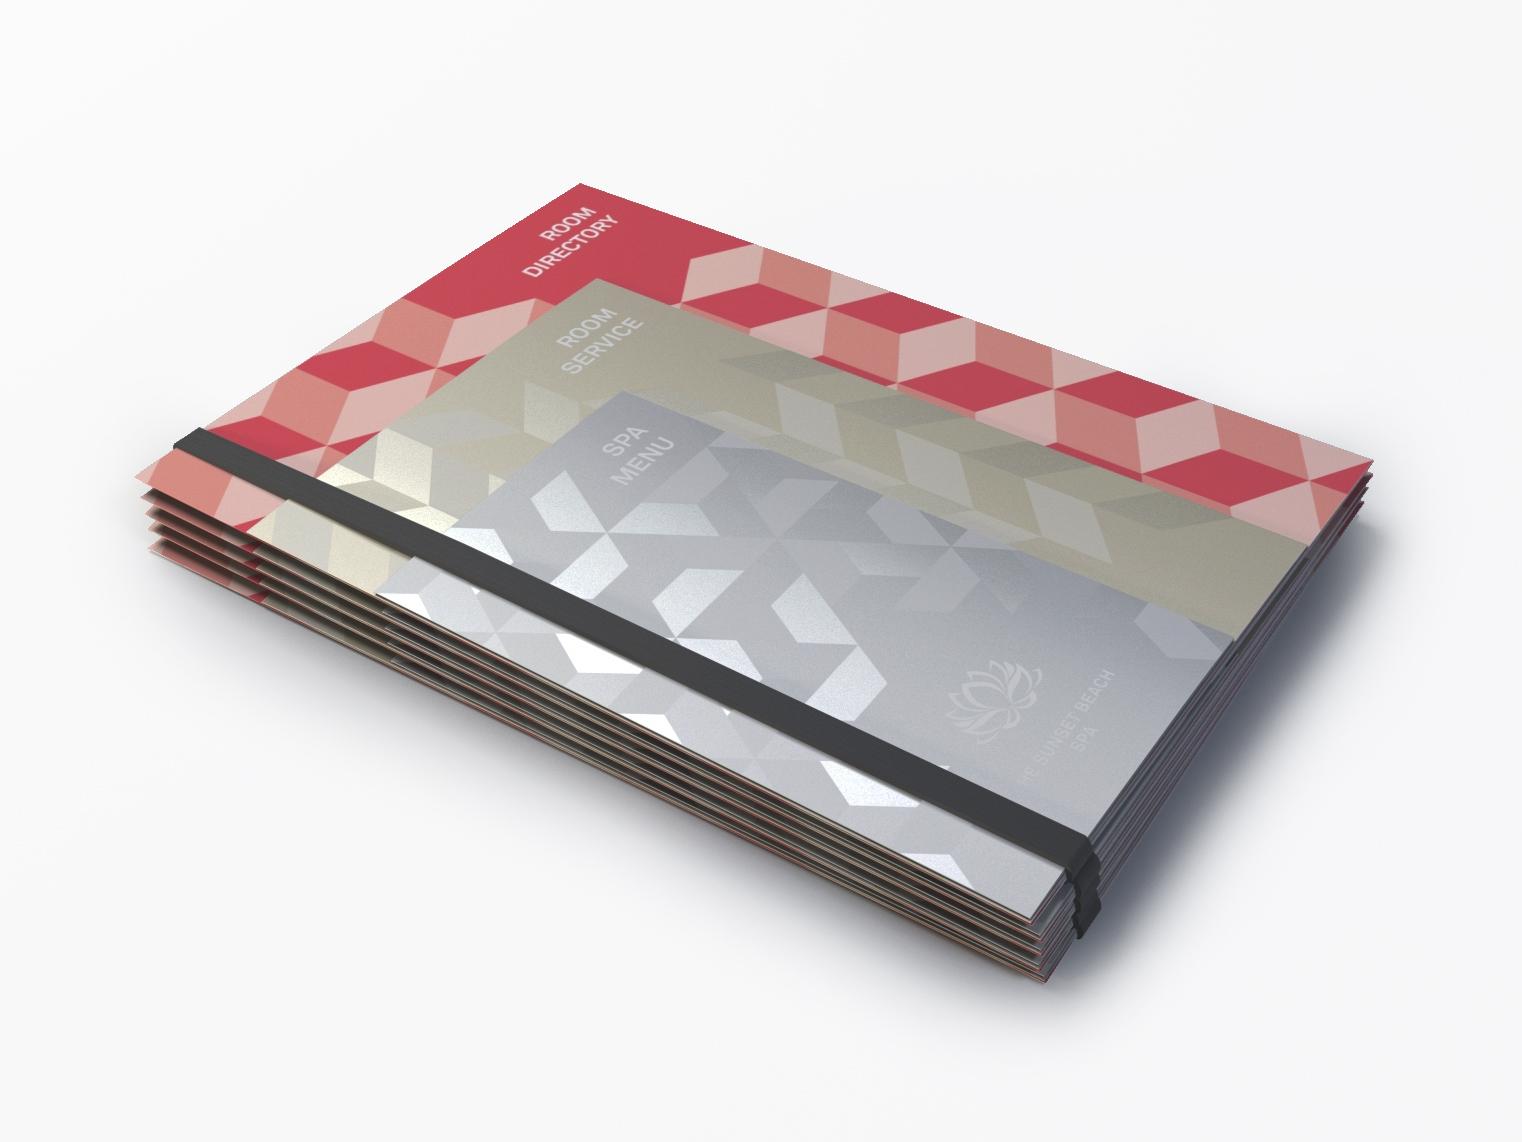 Sunset-Brochures-Directory-close-001_Vignette